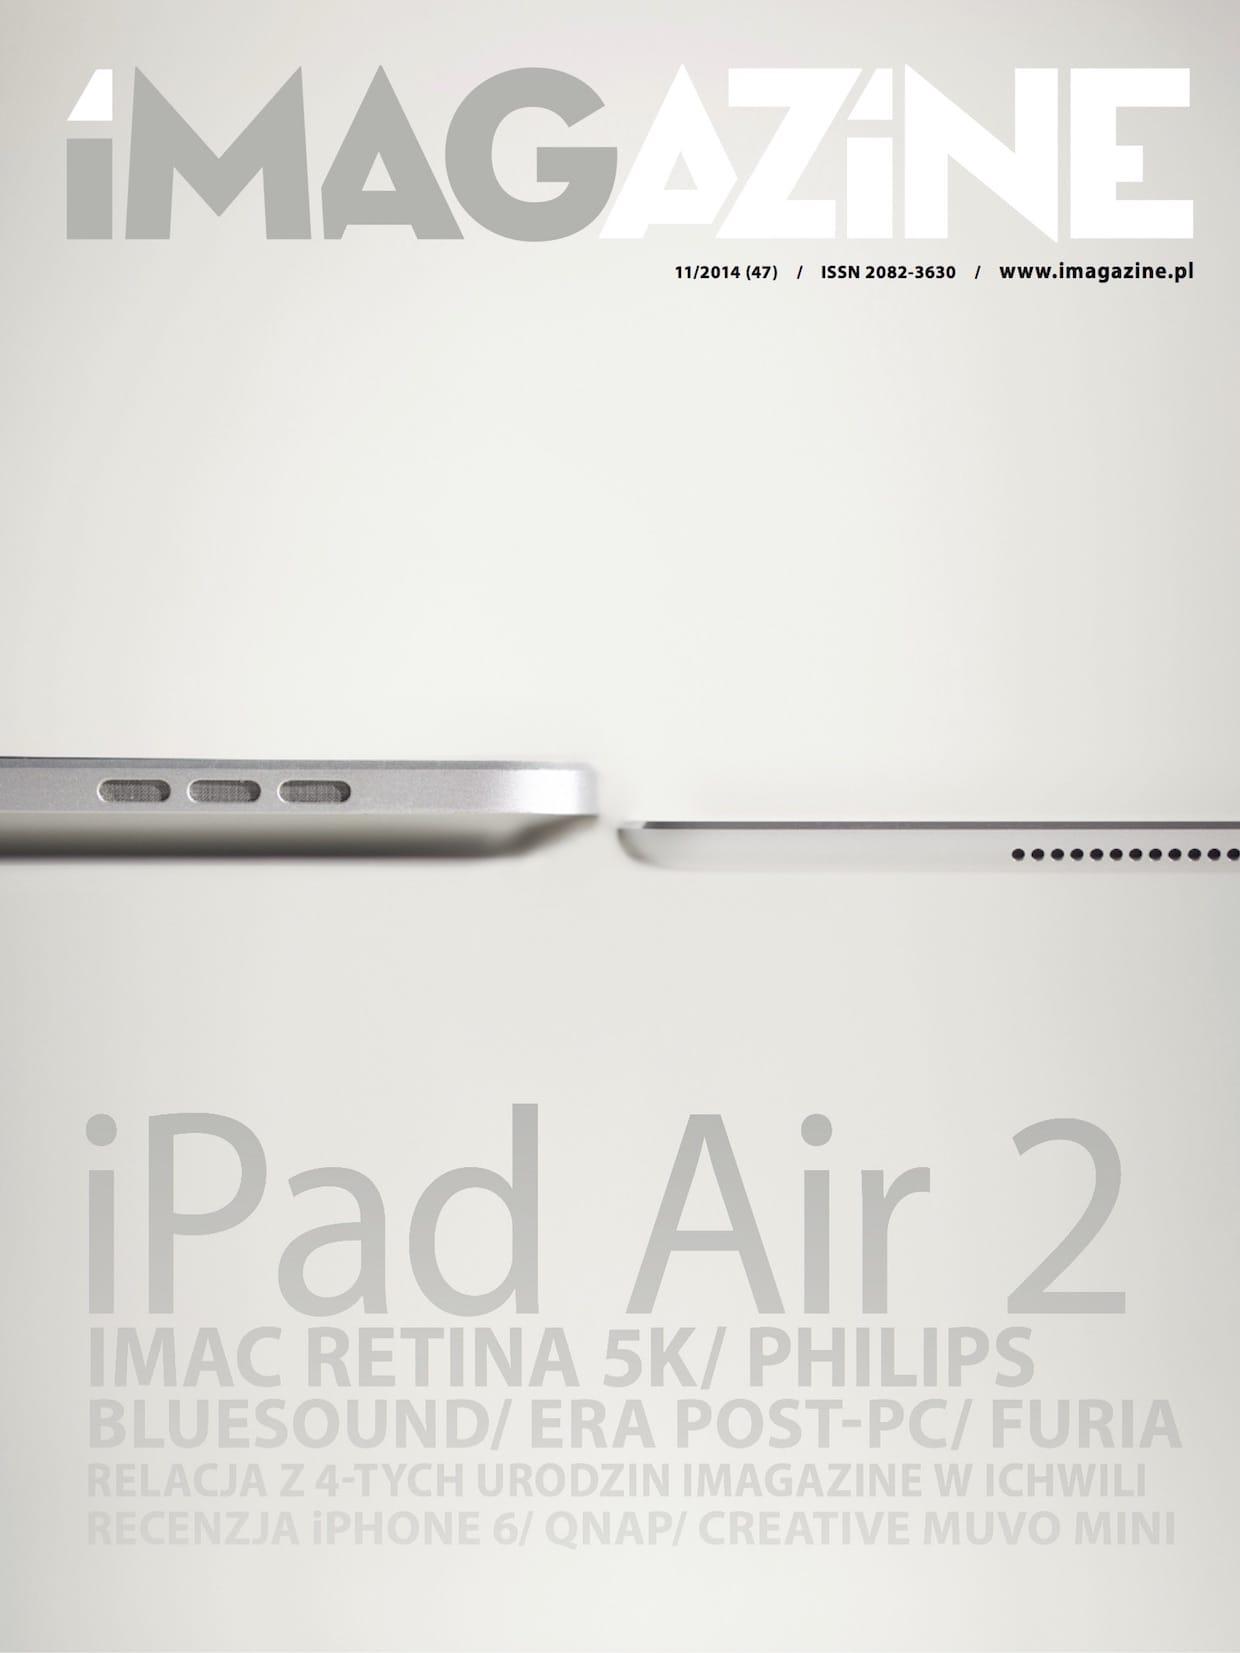 iMagazine 11/2014 – iPad Air 2